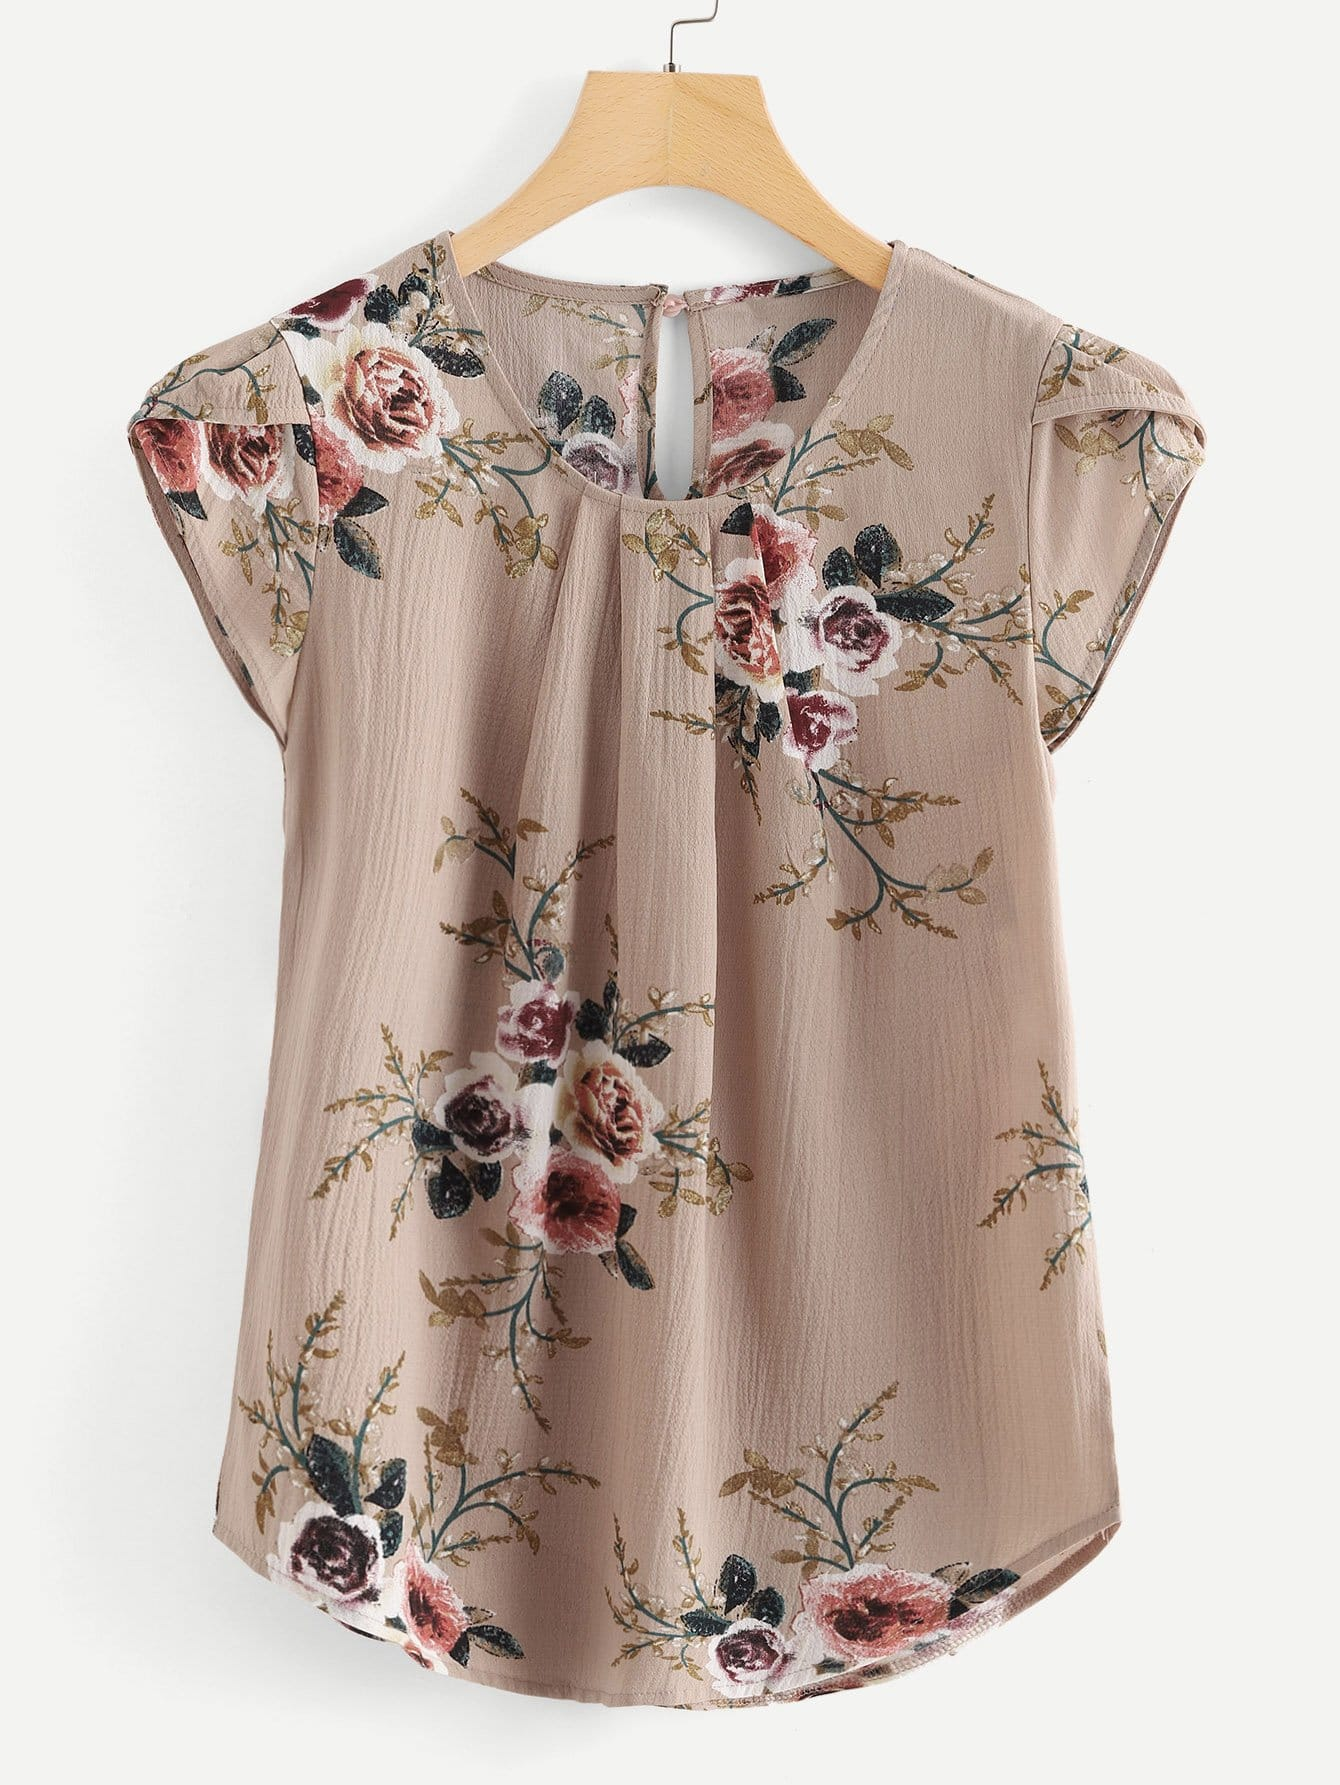 Petal Sleeve Floral Print Curved Hem Blouse ruched sleeve dolphin hem floral blouse